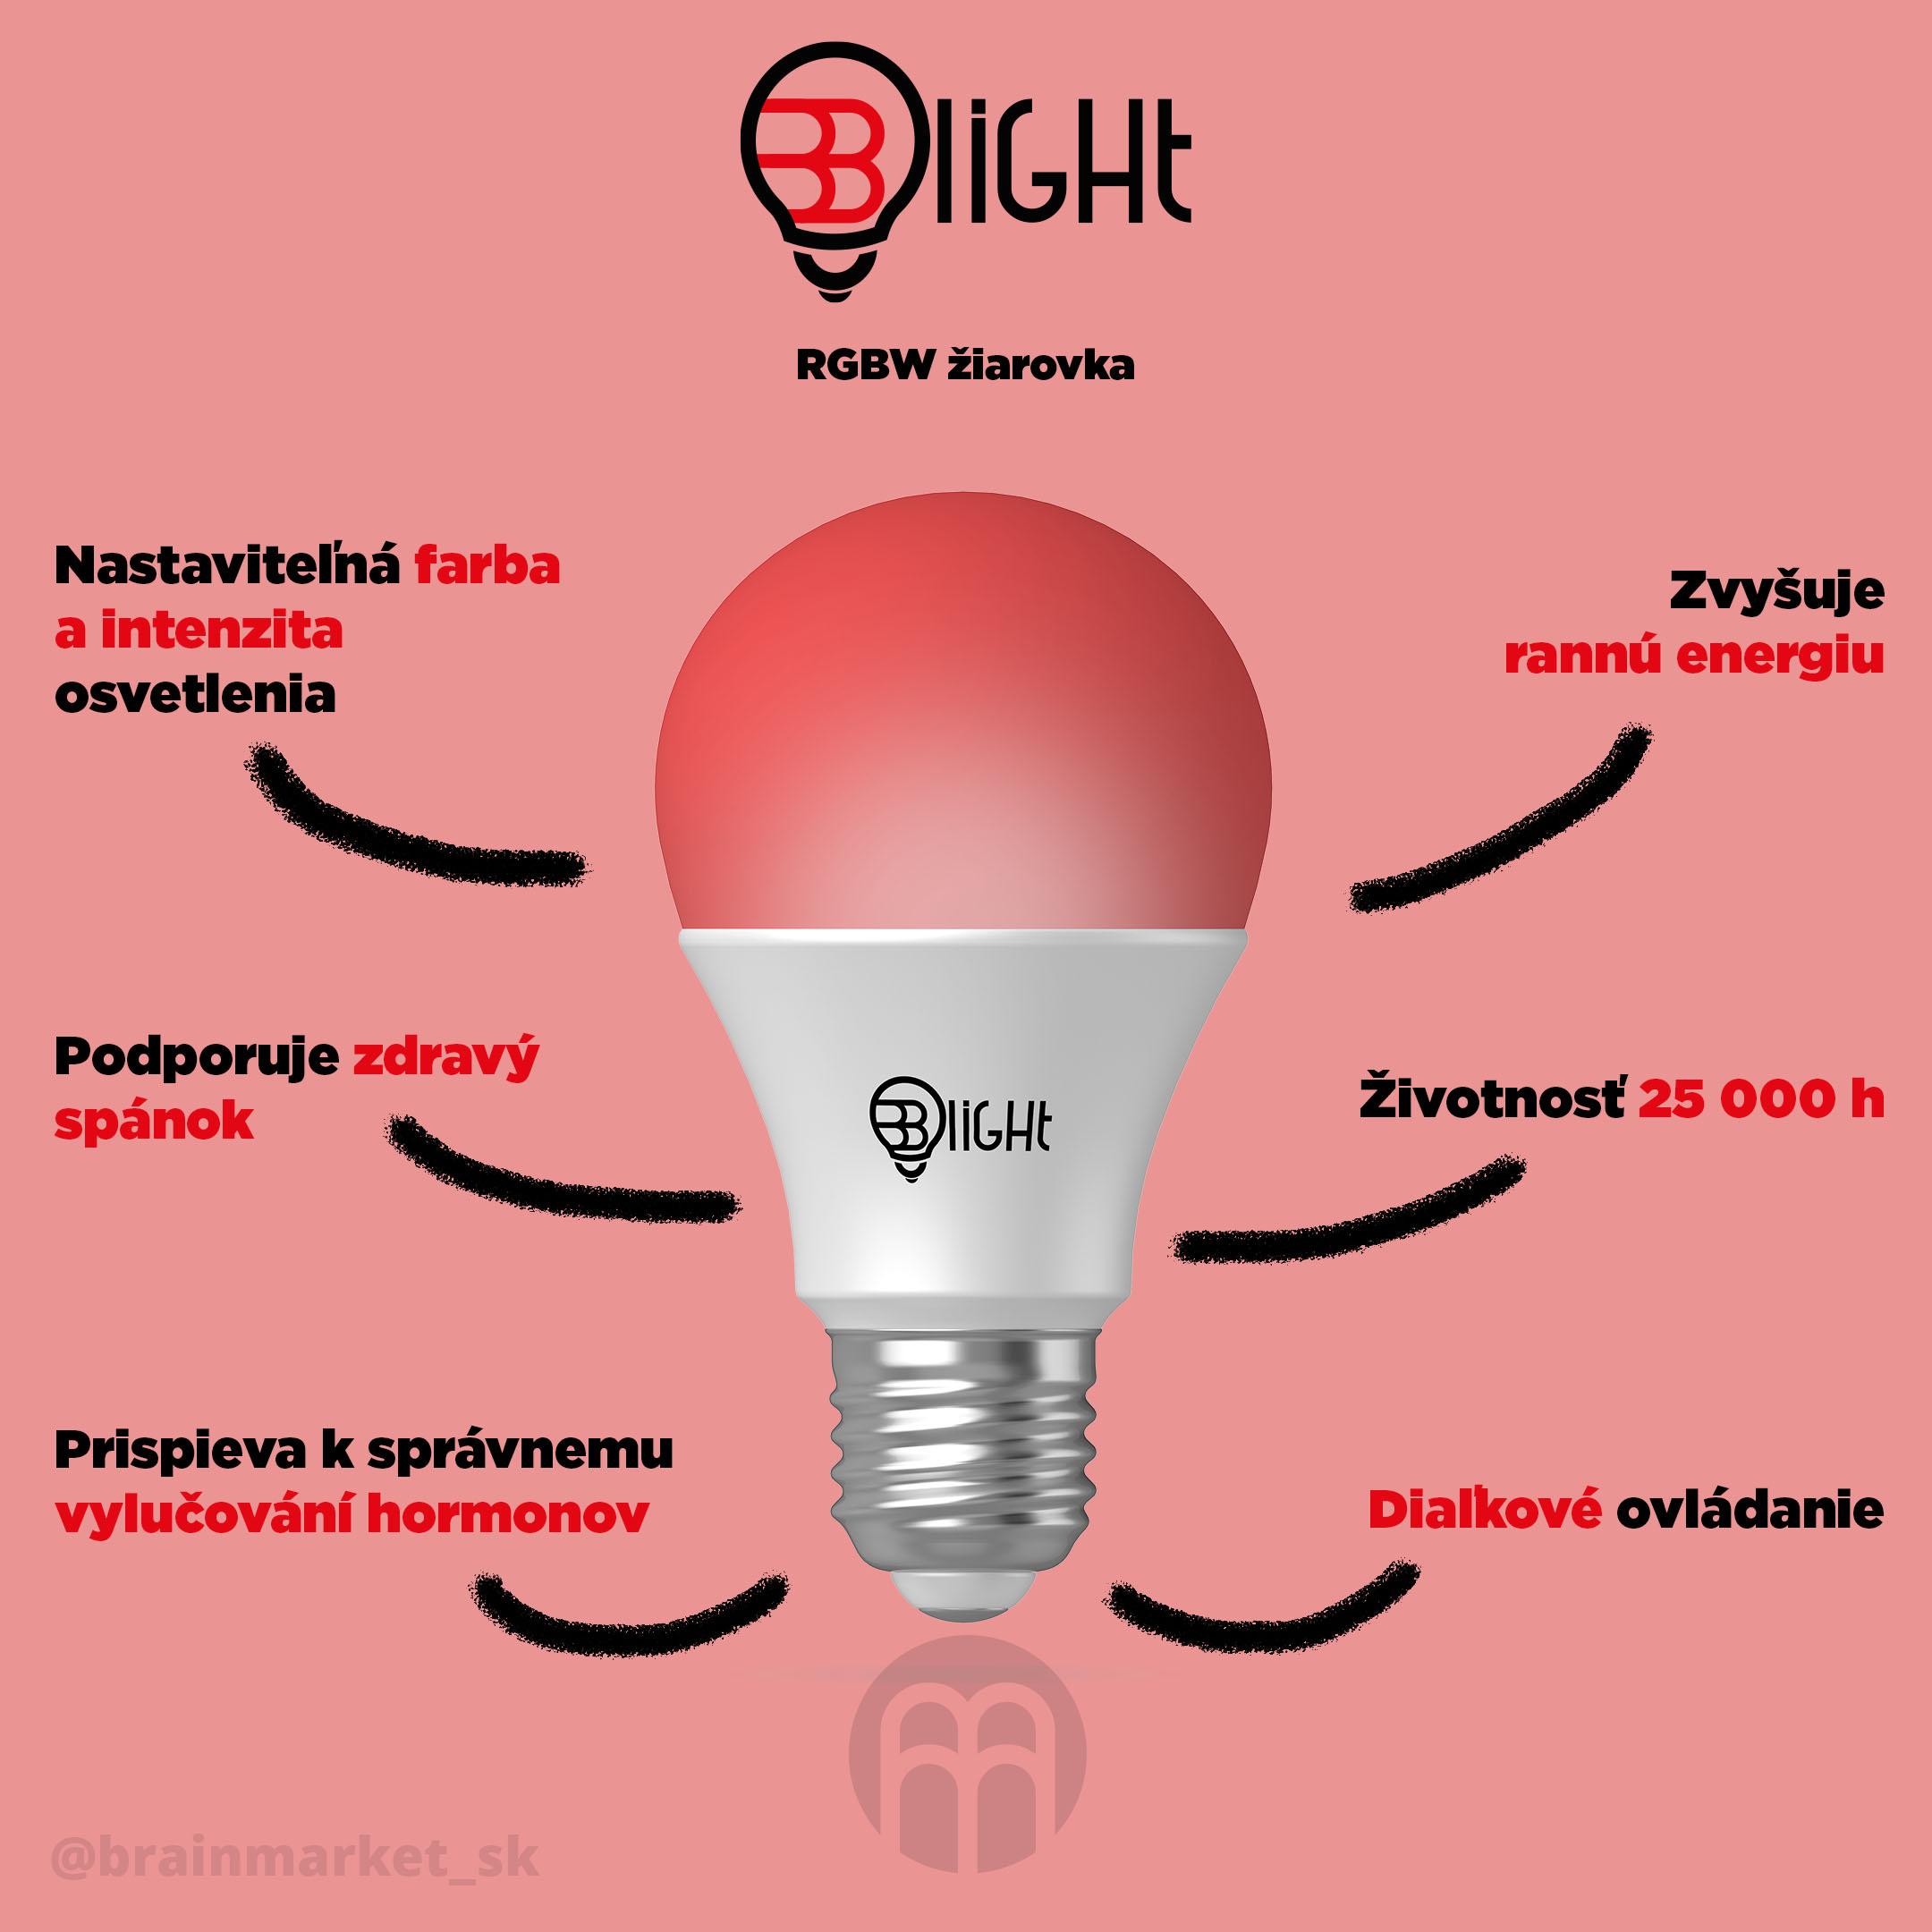 BLIGHT_rgbw_zarovka_infografika_brainmarket_SK